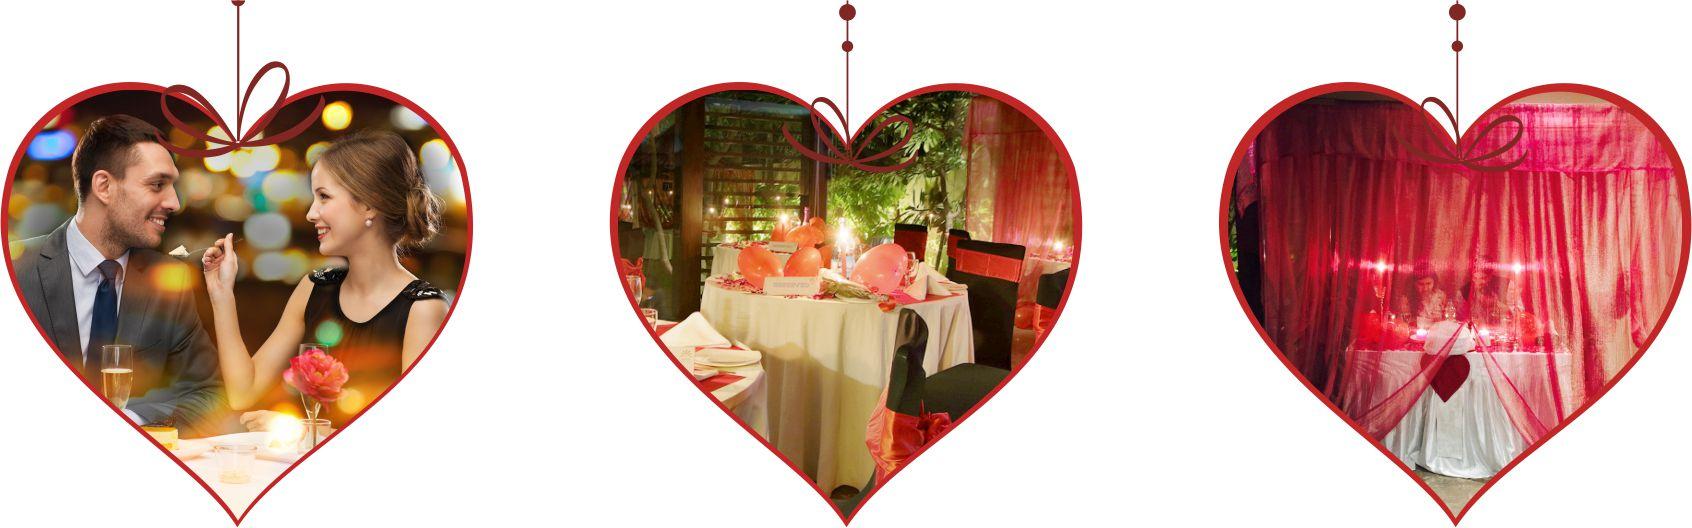 7 - Valentine's Day Special